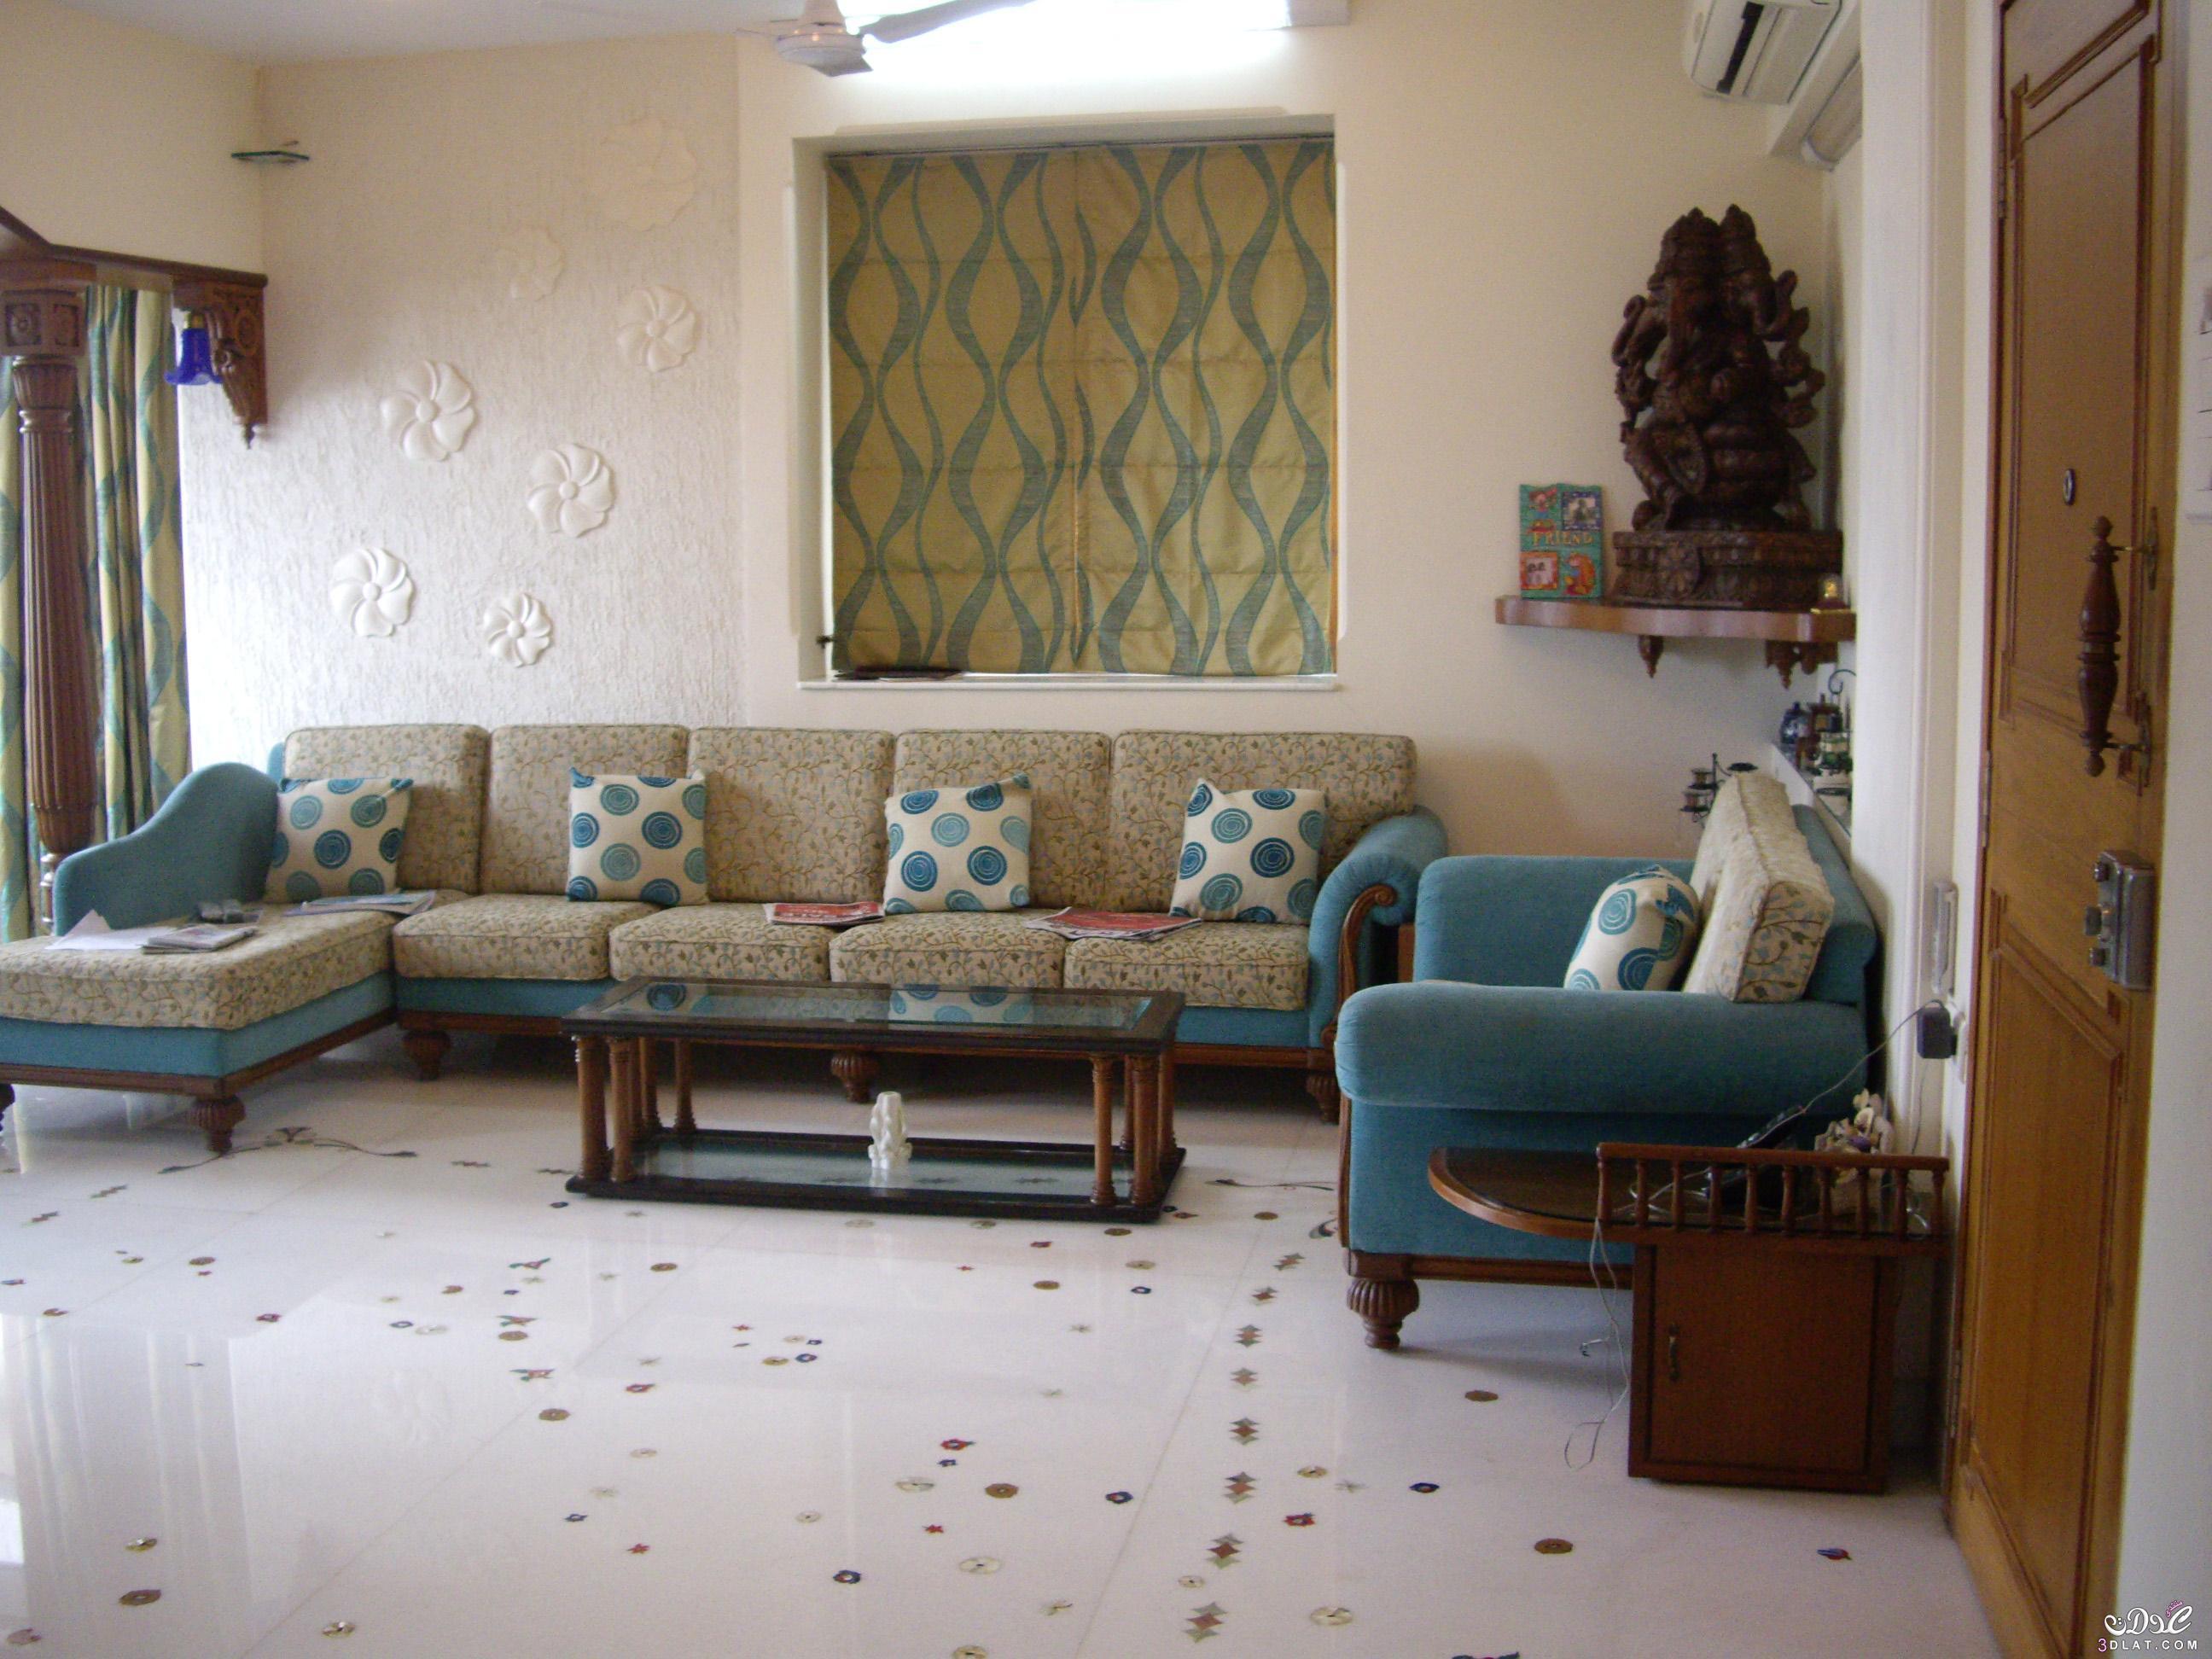 صور غرف جلوس , غرف معيشه عصريه تخطف الانظار